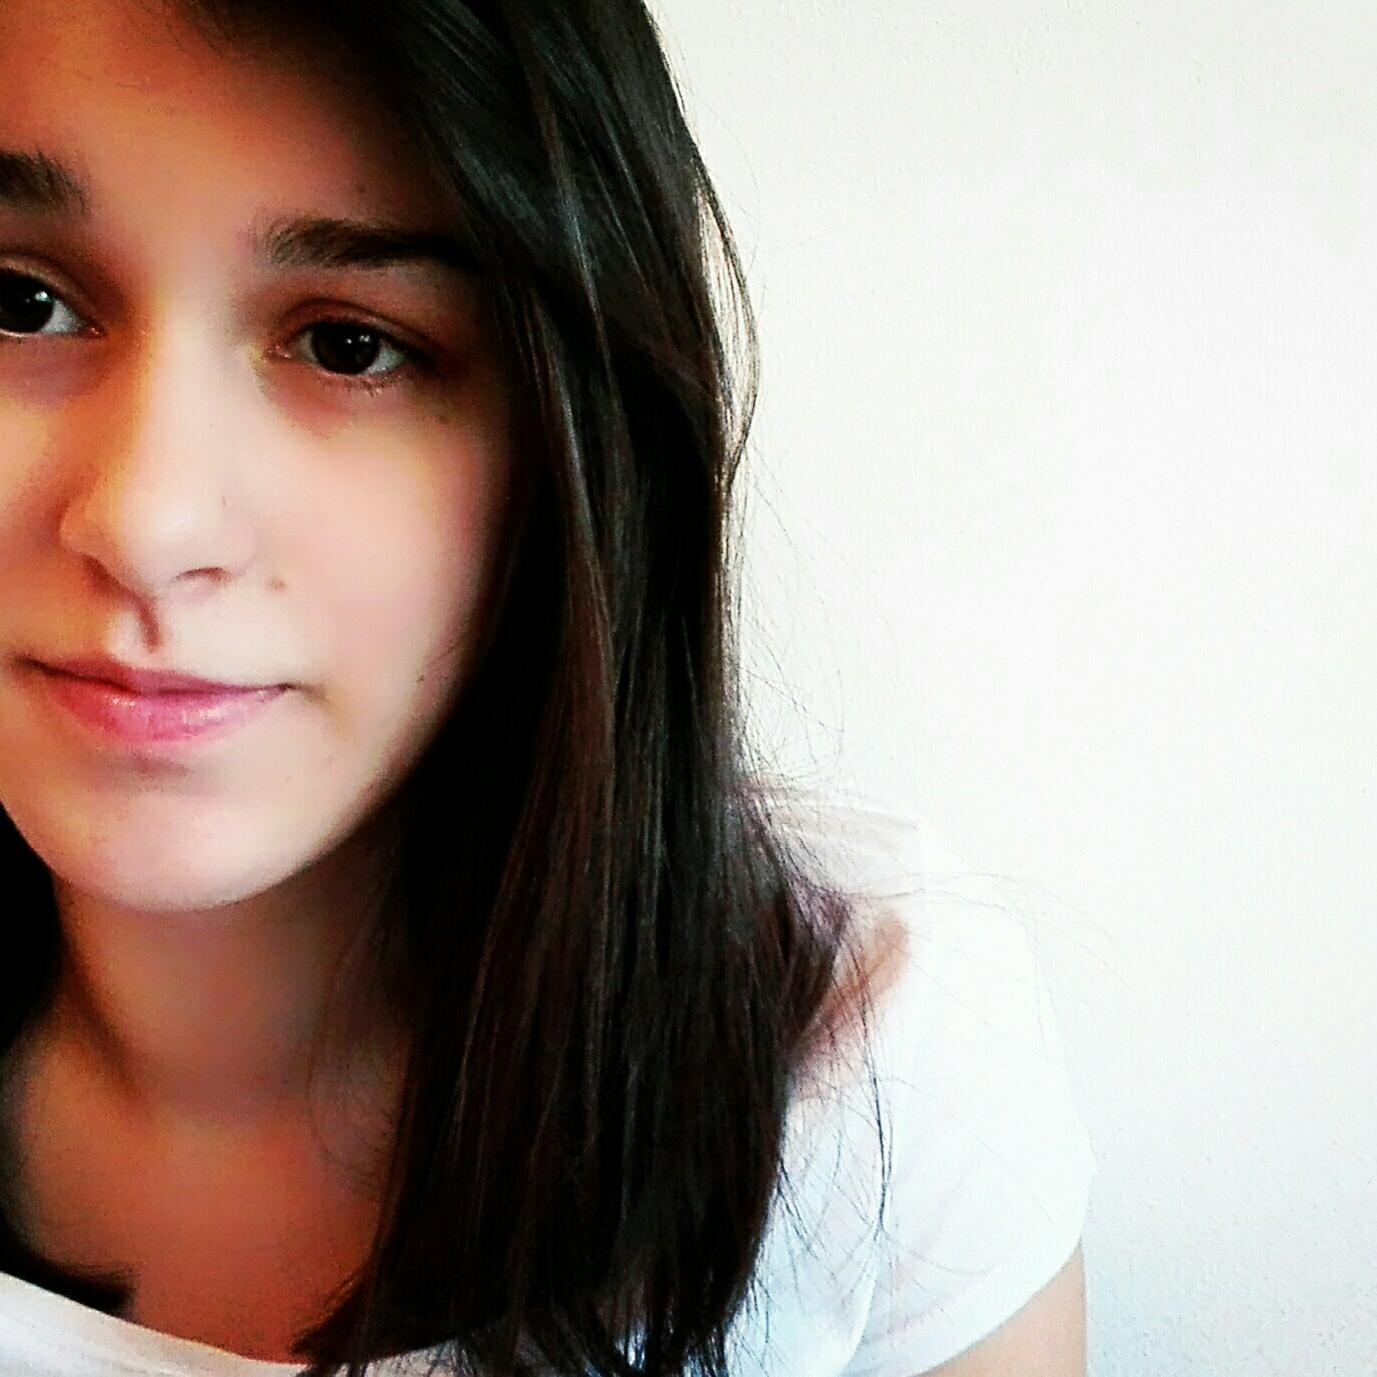 Lisbeth87